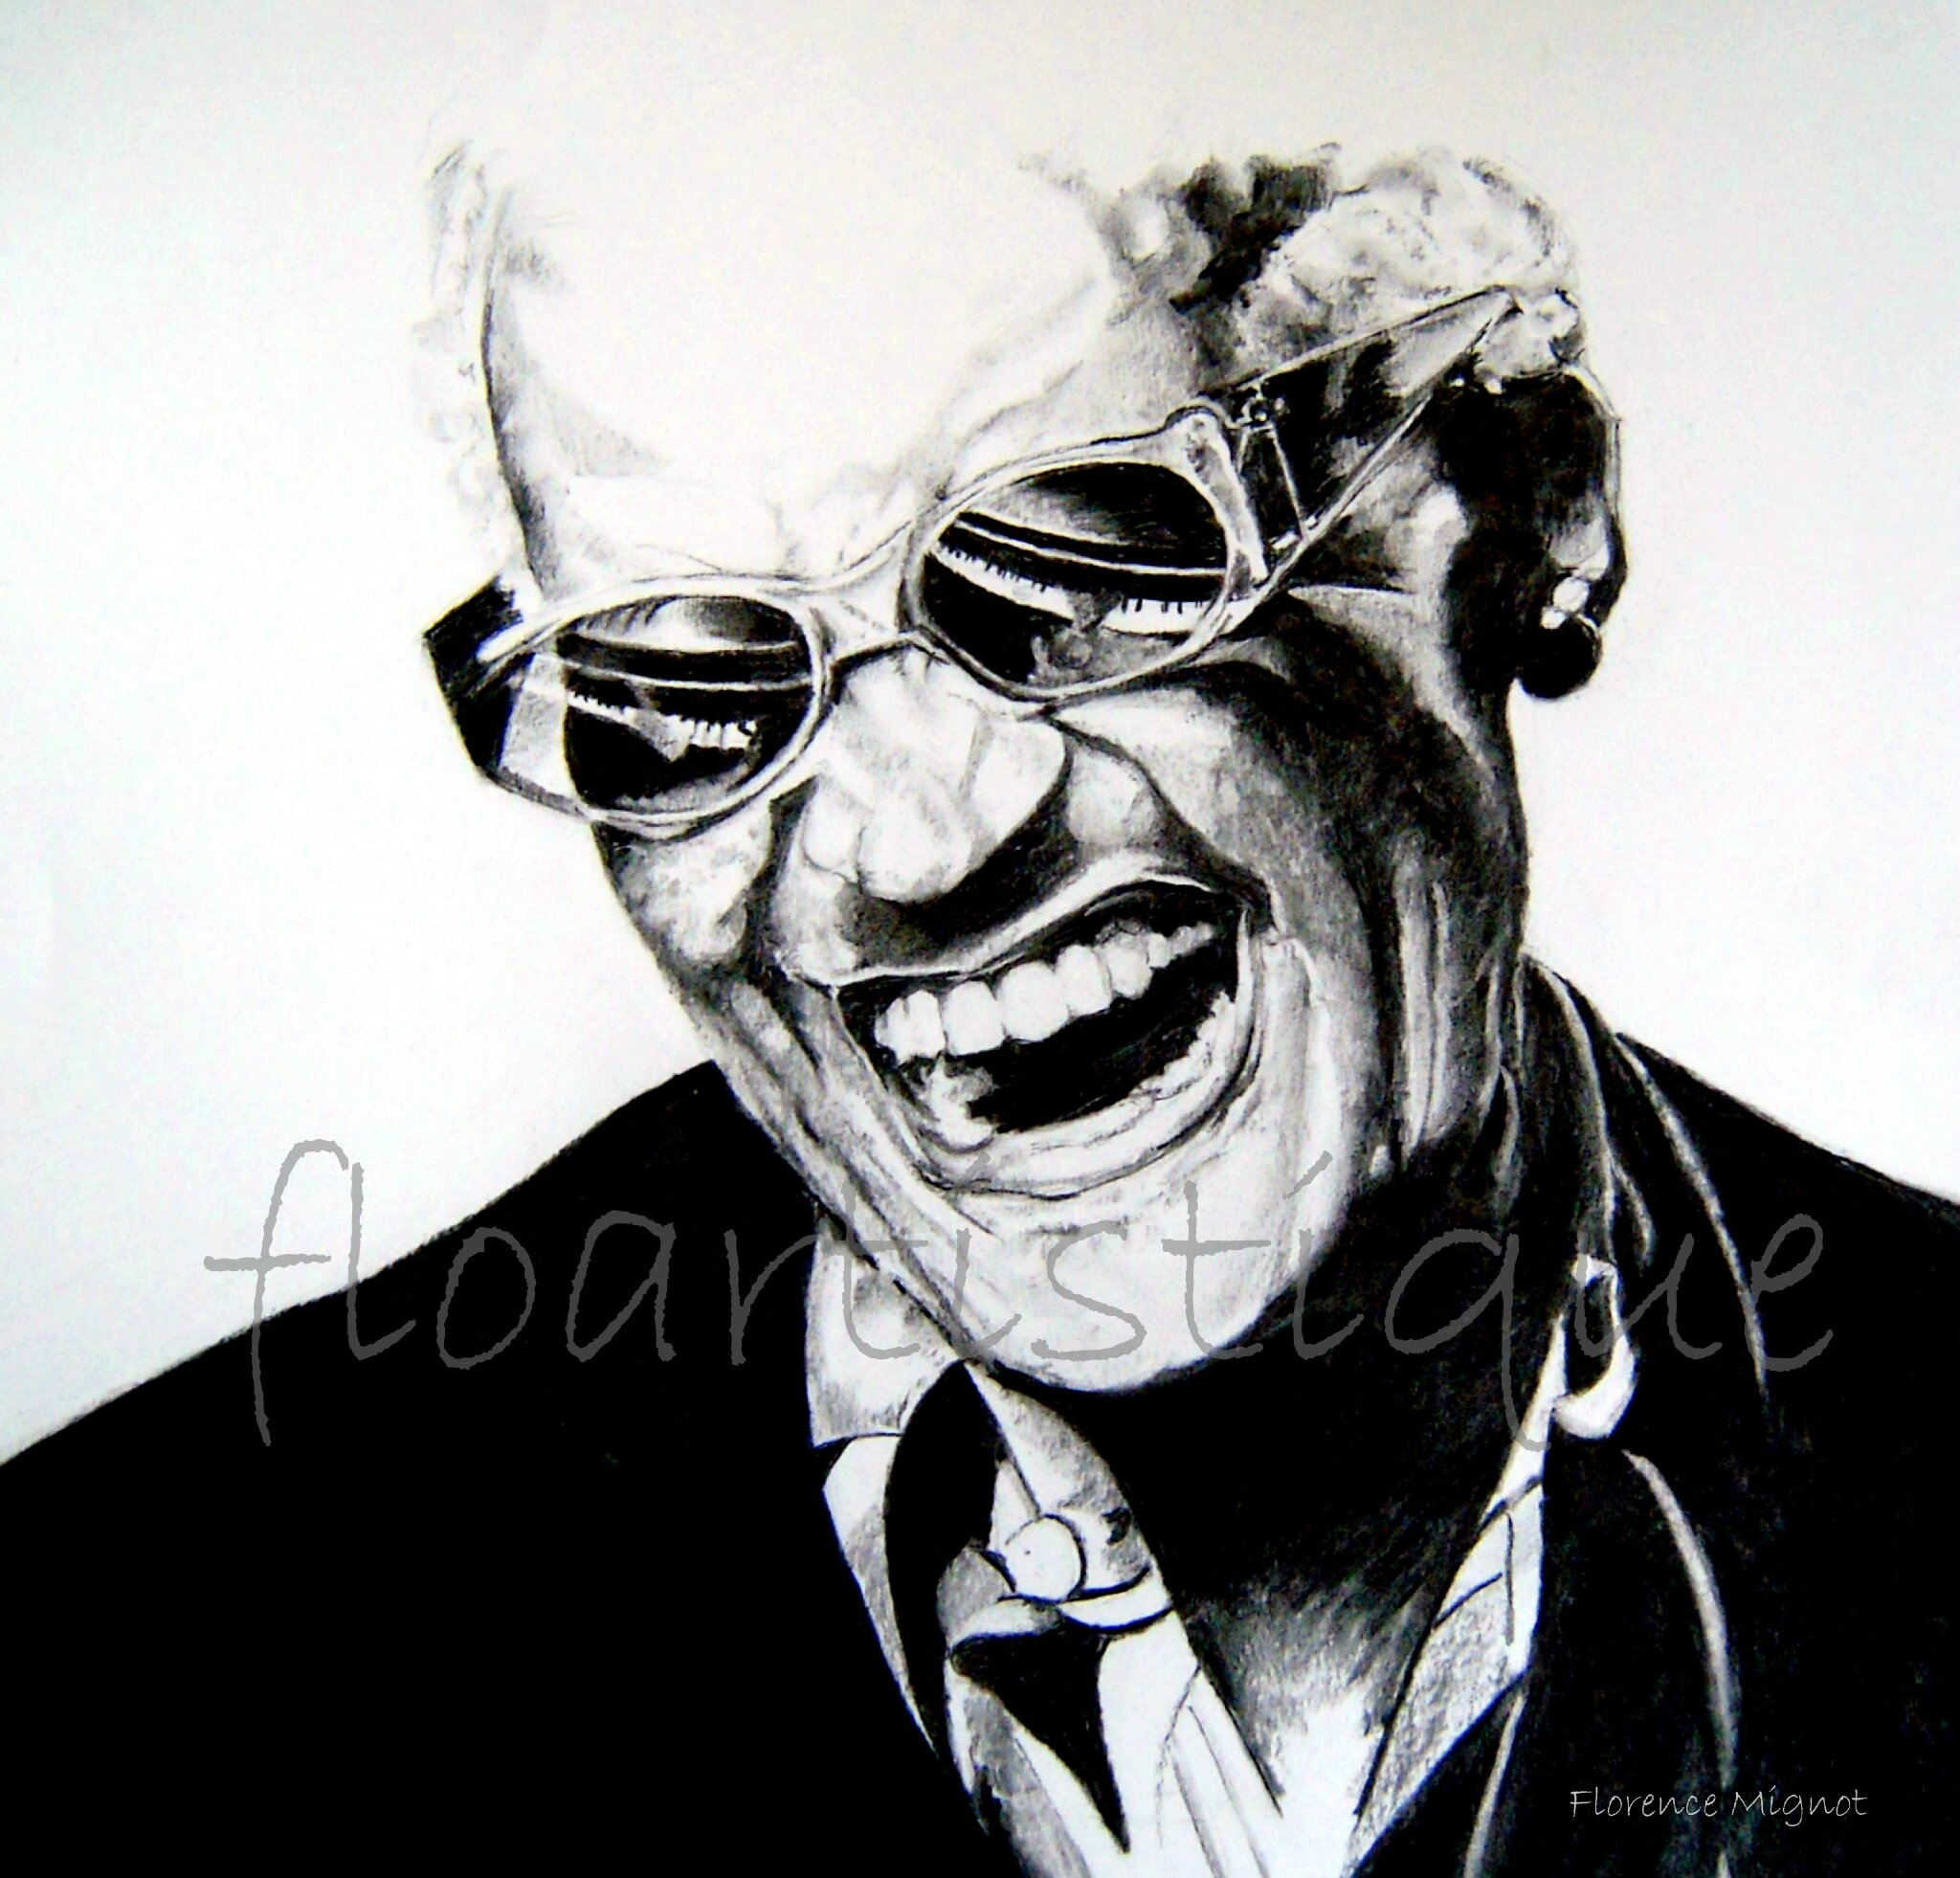 Portrait fusain - Ray Charles - VENDU